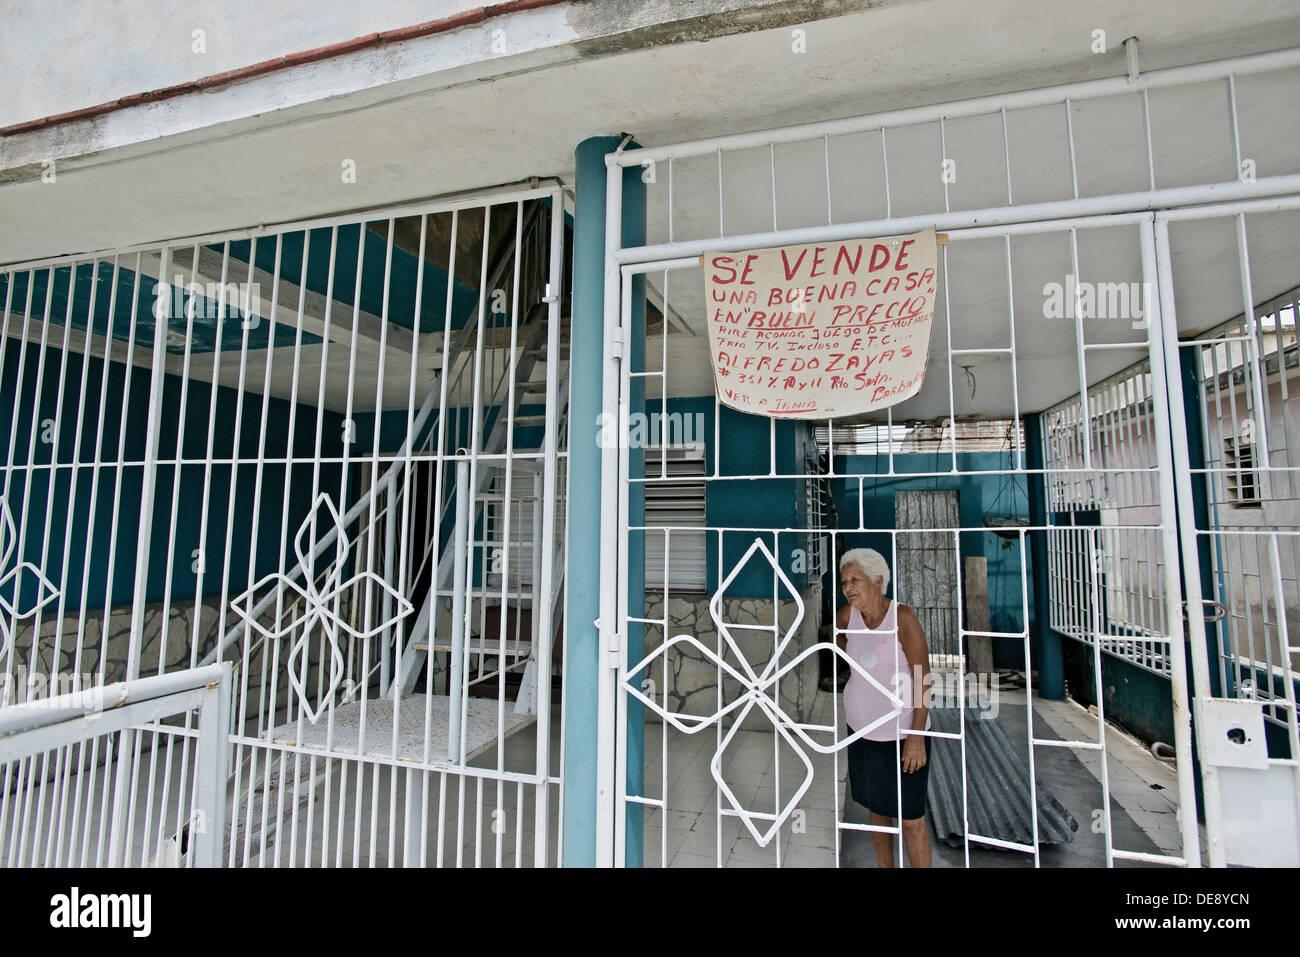 Santiago de Cuba, Cuba, sign for the legitimate private sale of houses / apartments - Stock Image